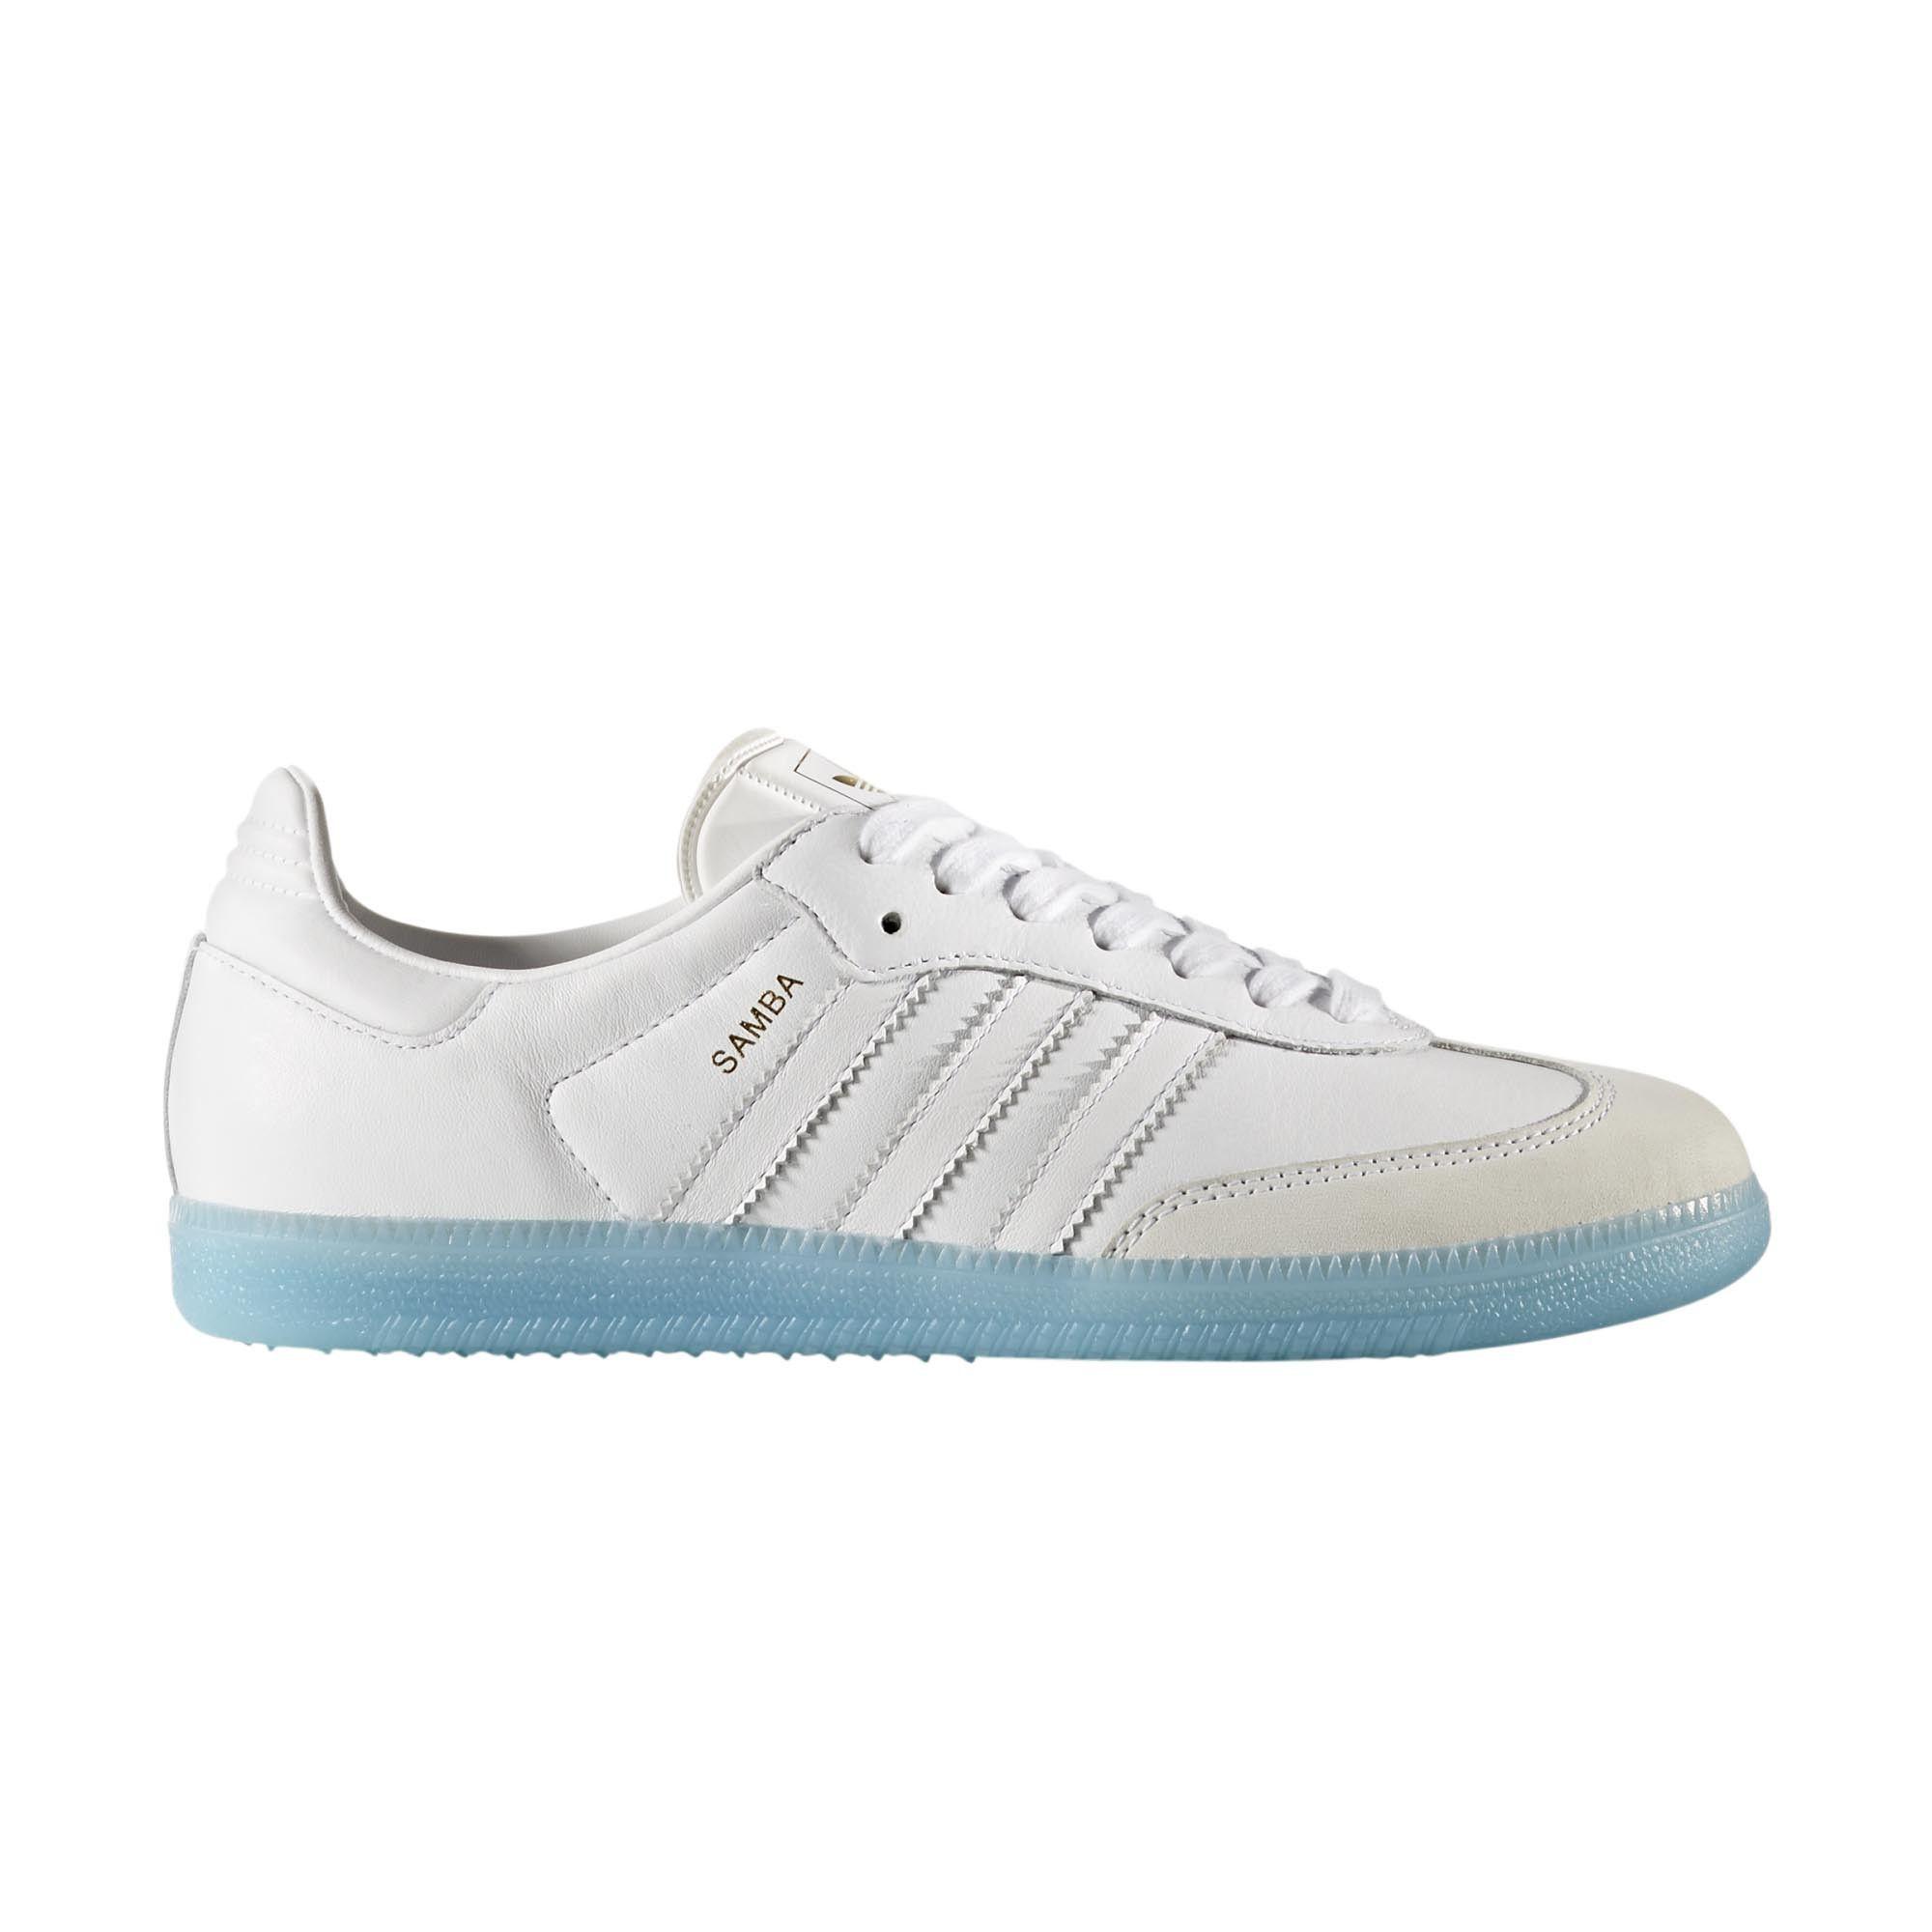 sale retailer 56e6e d0858 Buty damskie adidas SAMBA W (BY2966) - 36 23